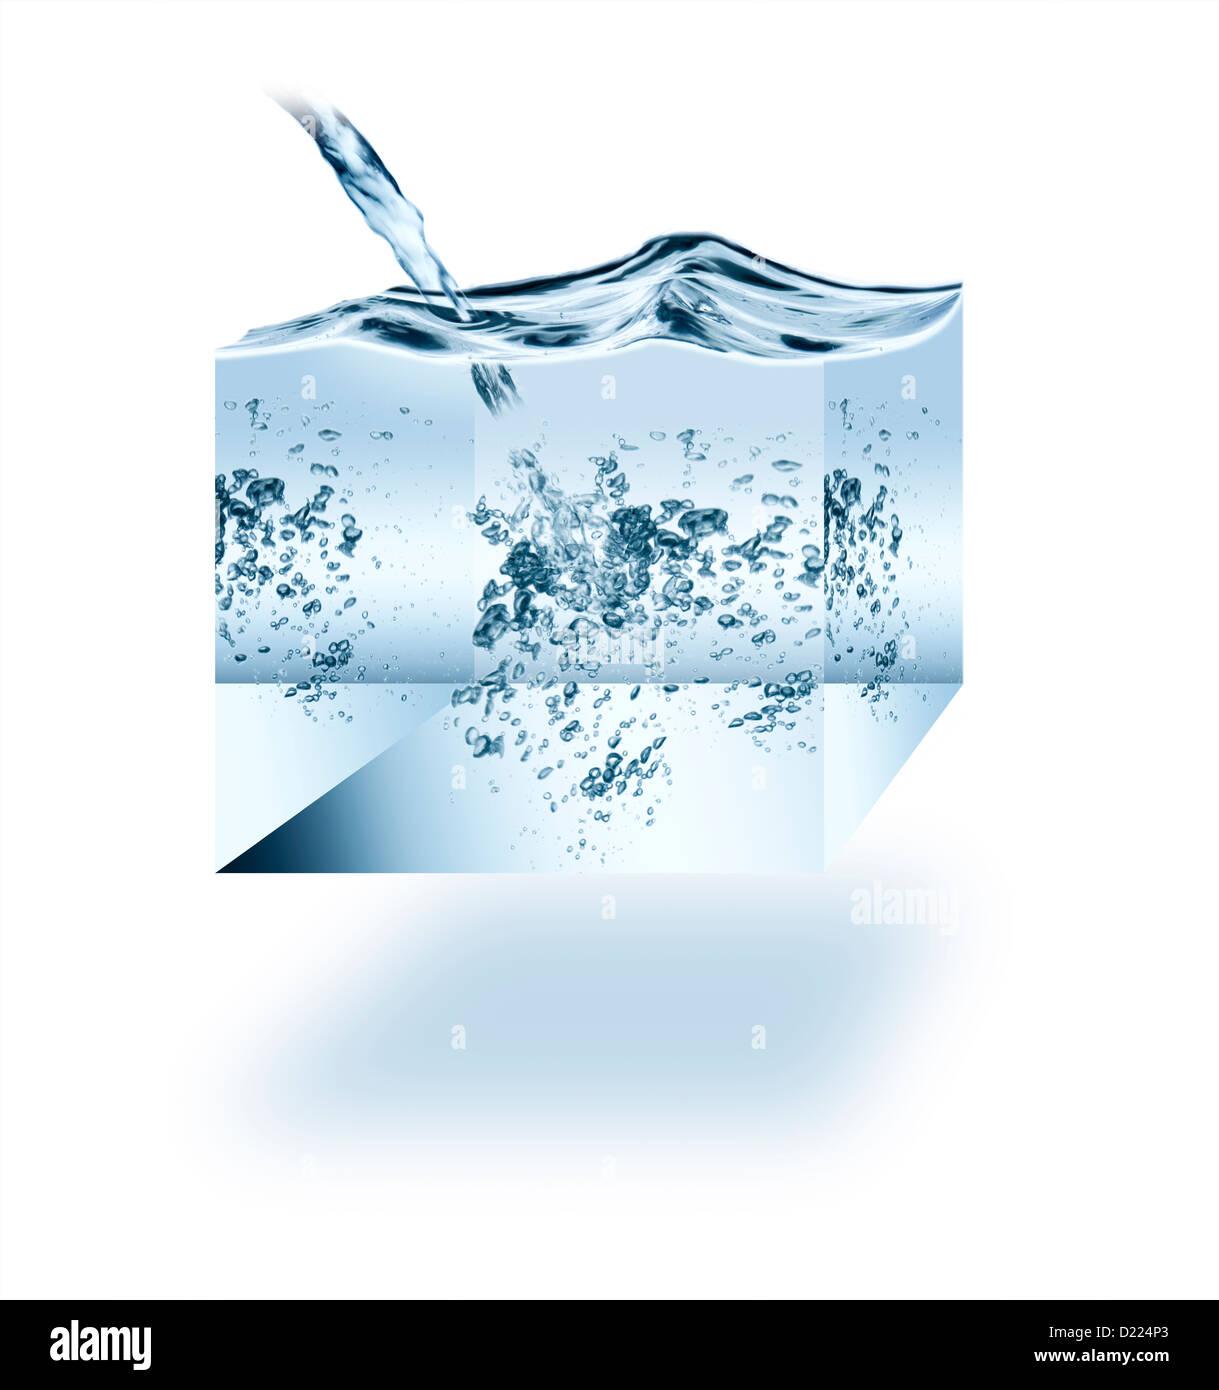 Cubo de agua sobre un fondo blanco. Imagen De Stock